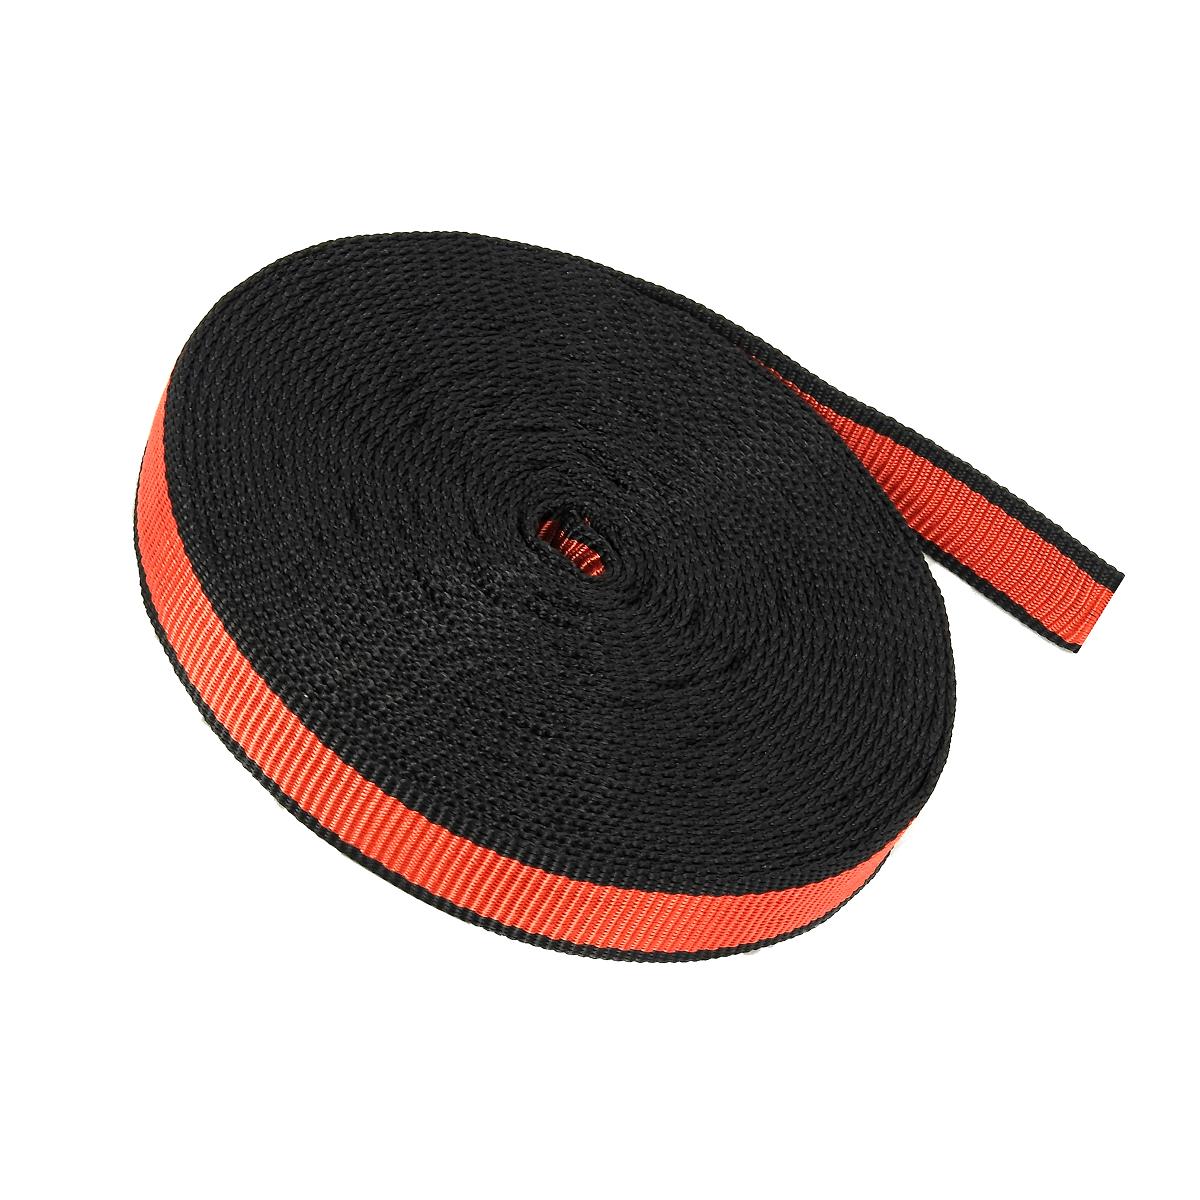 Fita Tubular 25mm 22kN Vermelha (Rolo 25 Metros) - Exclusividade ALPIMONTE